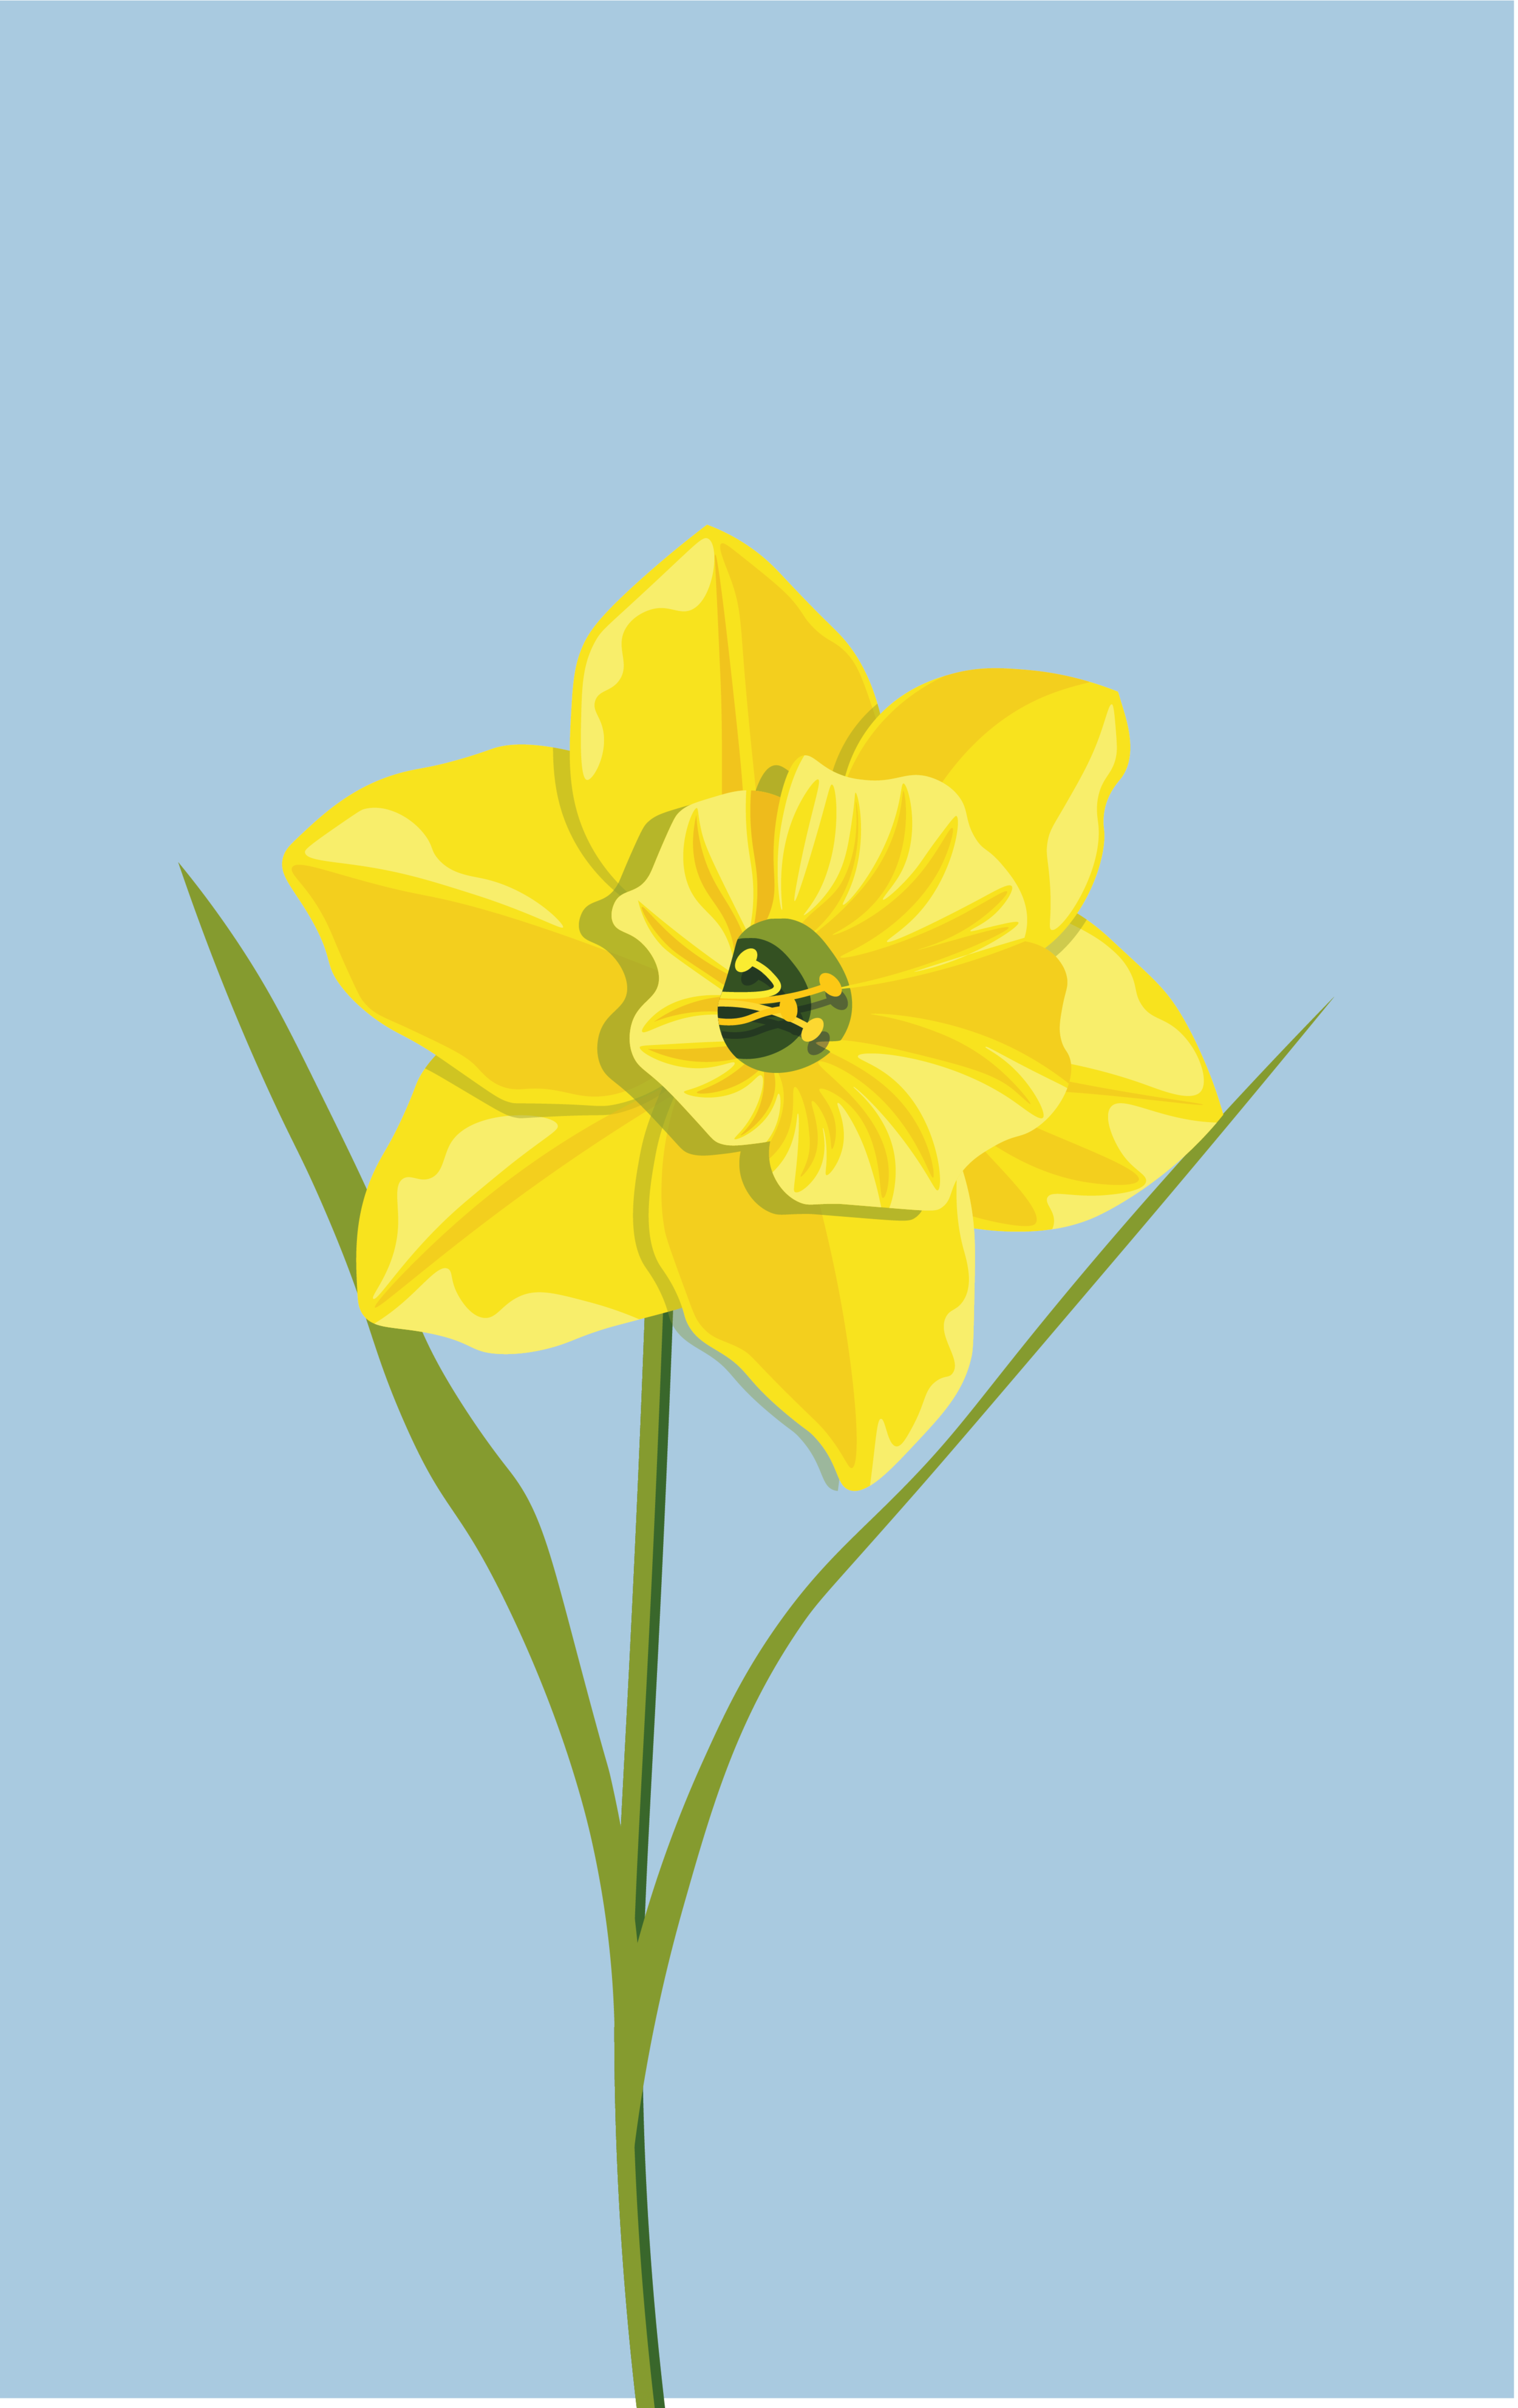 Flower_CARD_Tavola disegno 1 copia.png